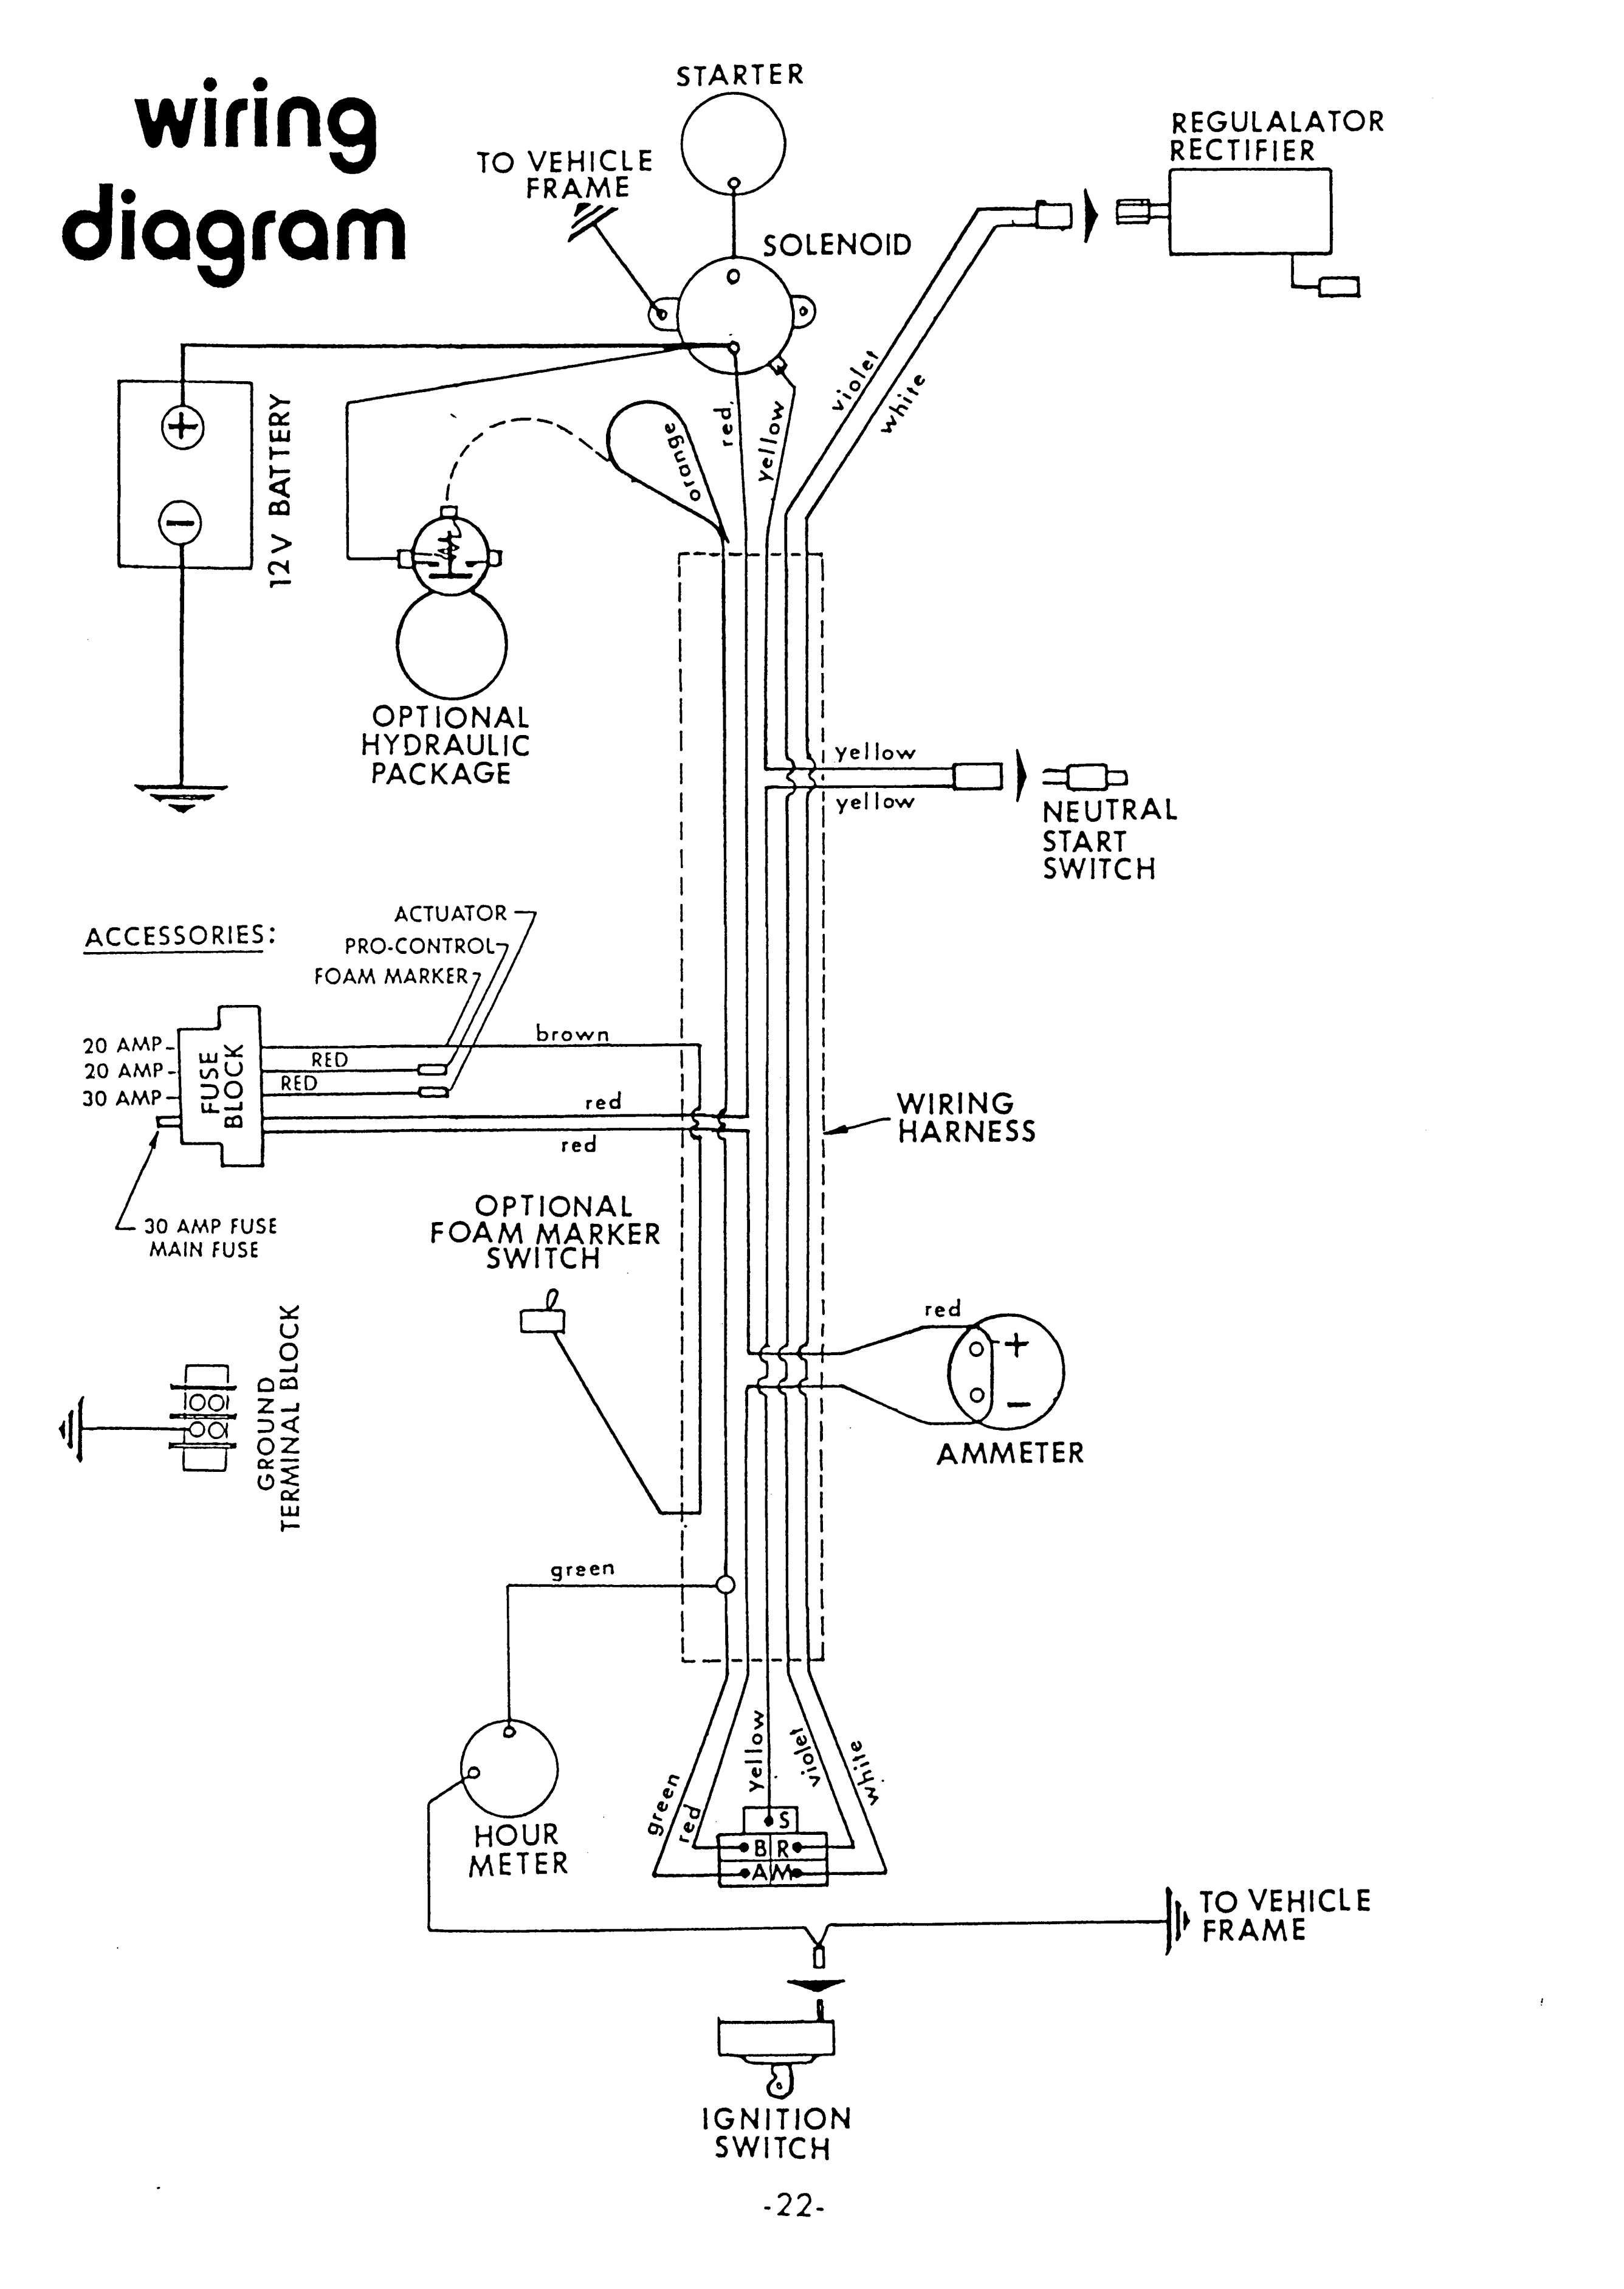 15 Wiring Diagram For Lawn Mower Kohler Engine